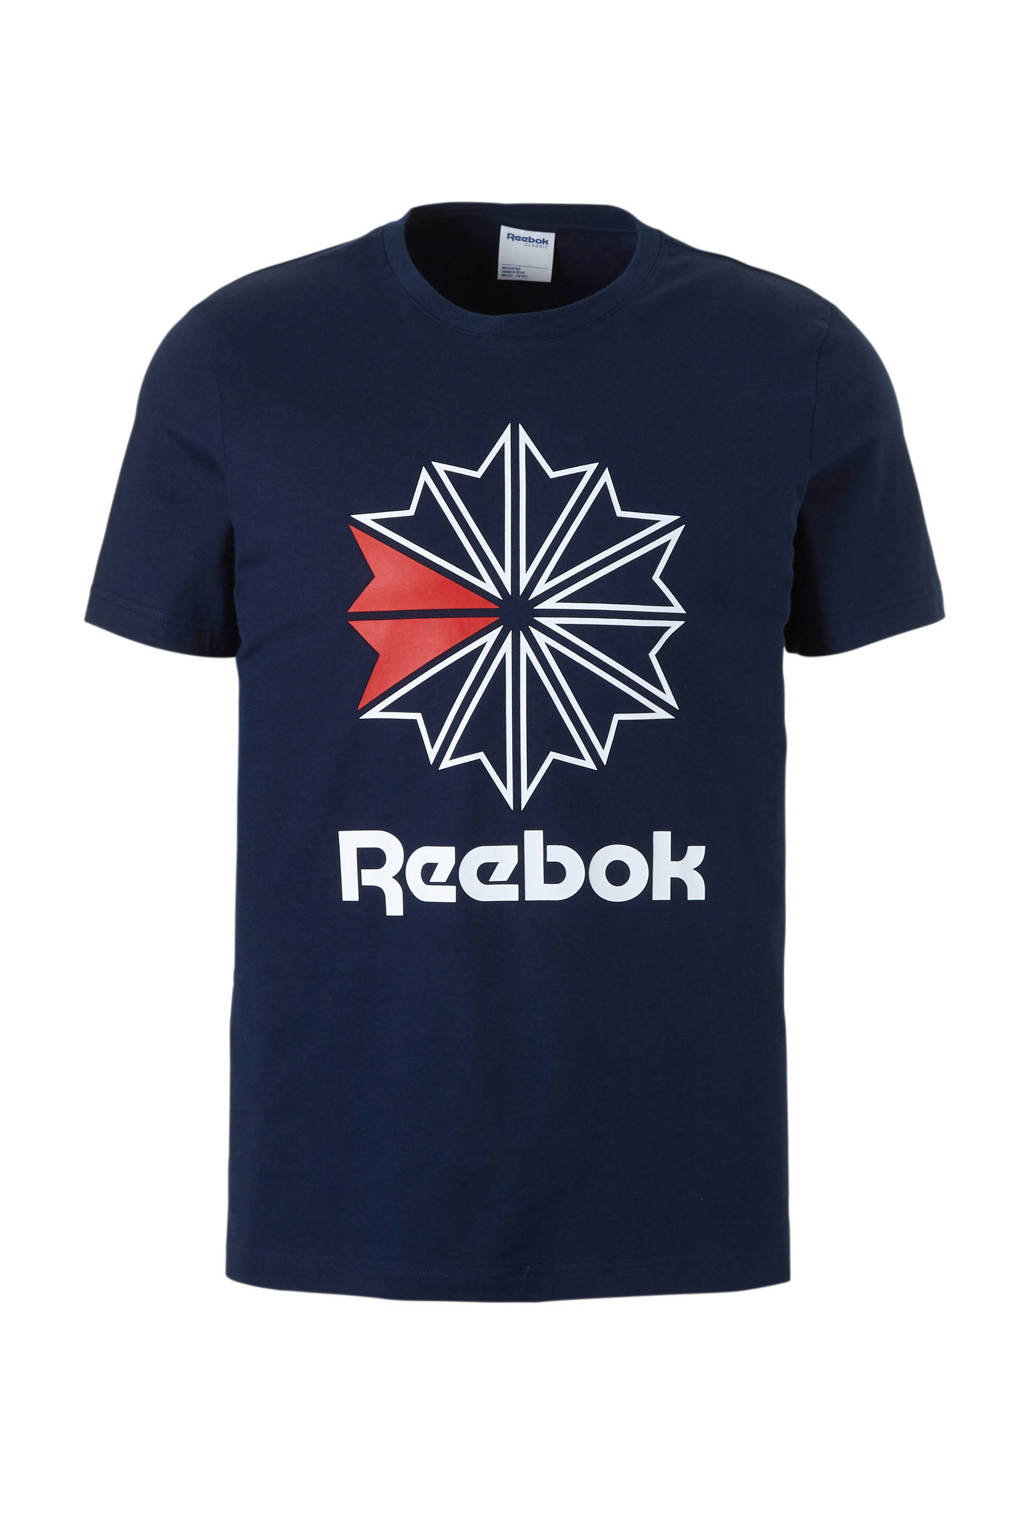 Reebok Classics   T-shirt donkerblauw, Donkerblauw